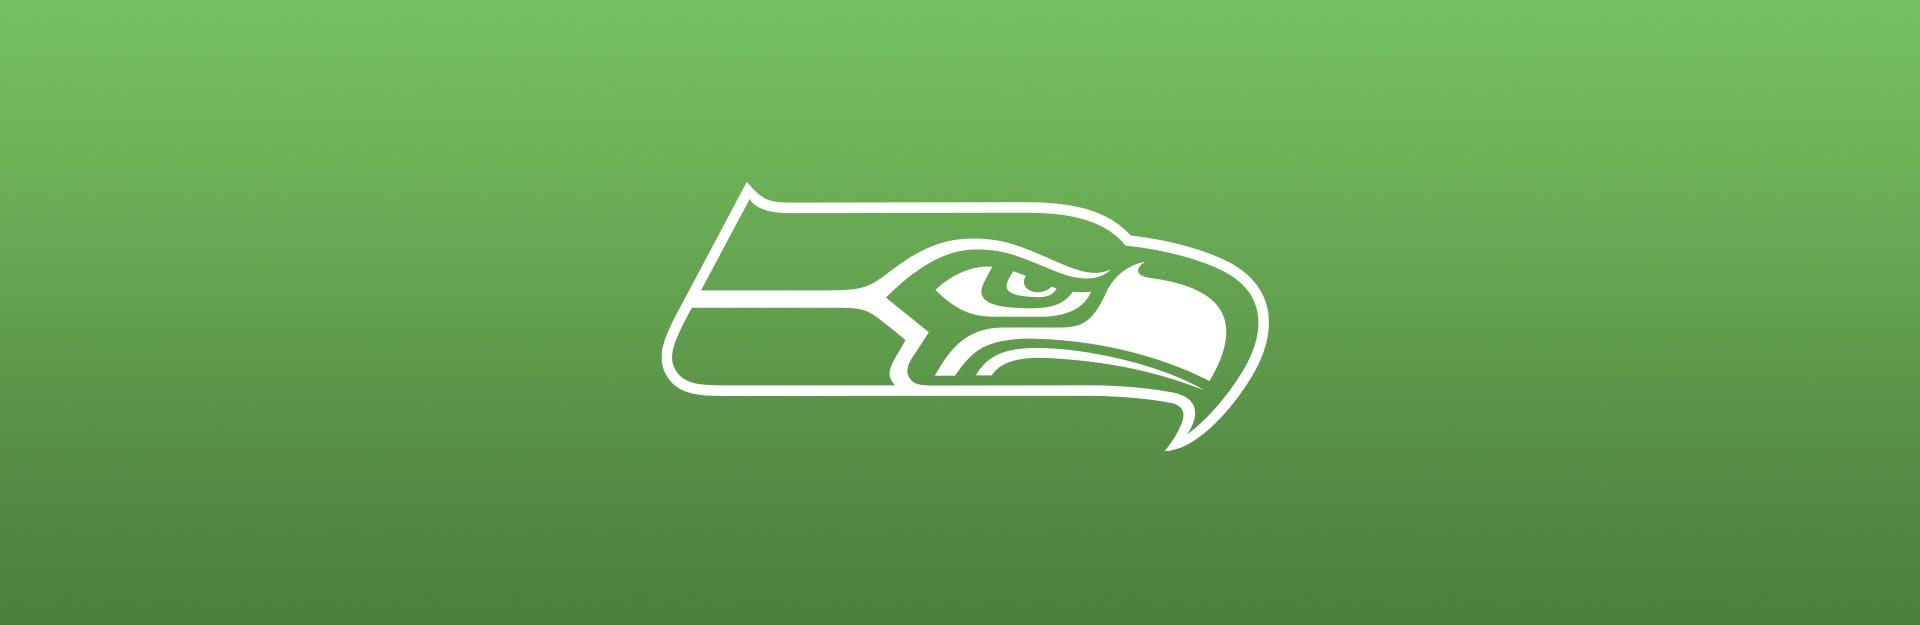 Seattle Seahawks logo overlaid on light green background